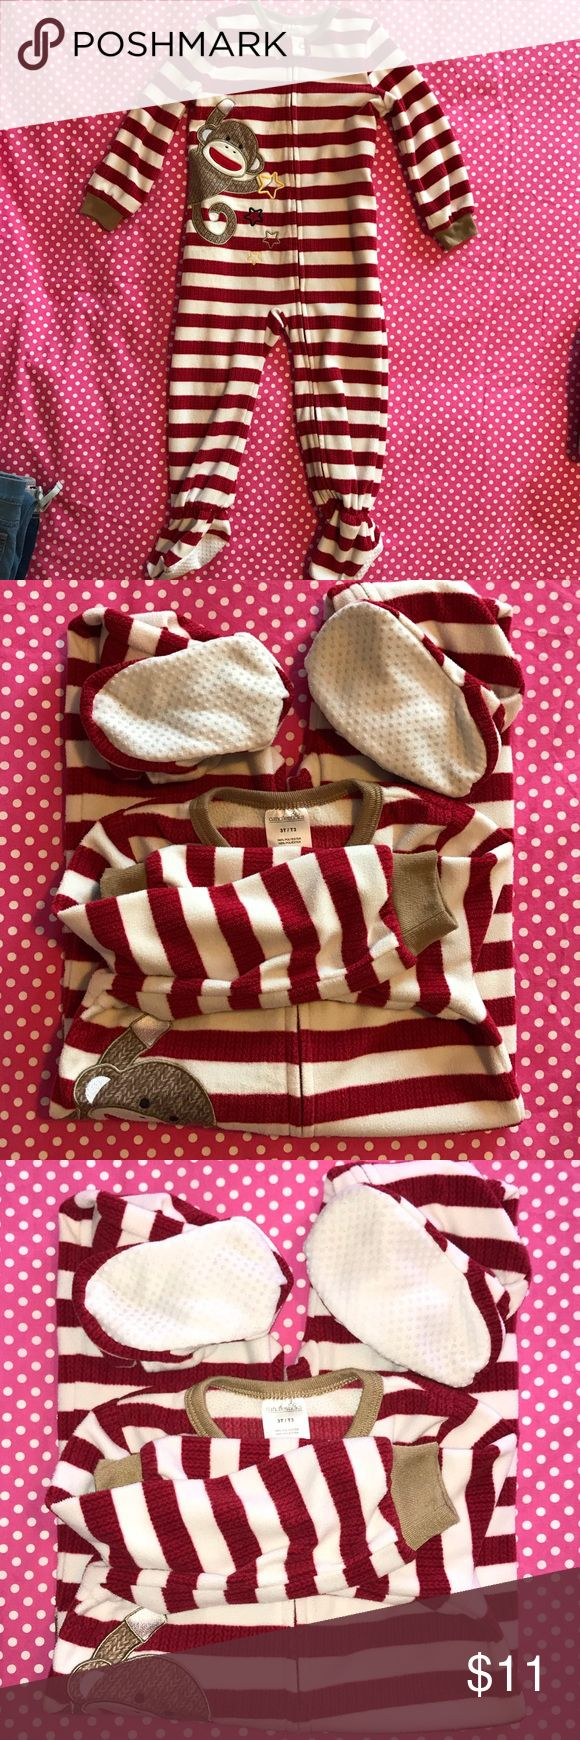 Sock Monkey PJ's Very soft, super cute, striped sock monkey PJ onesie. Never worn, but has been washed. Pajamas Pajama Sets